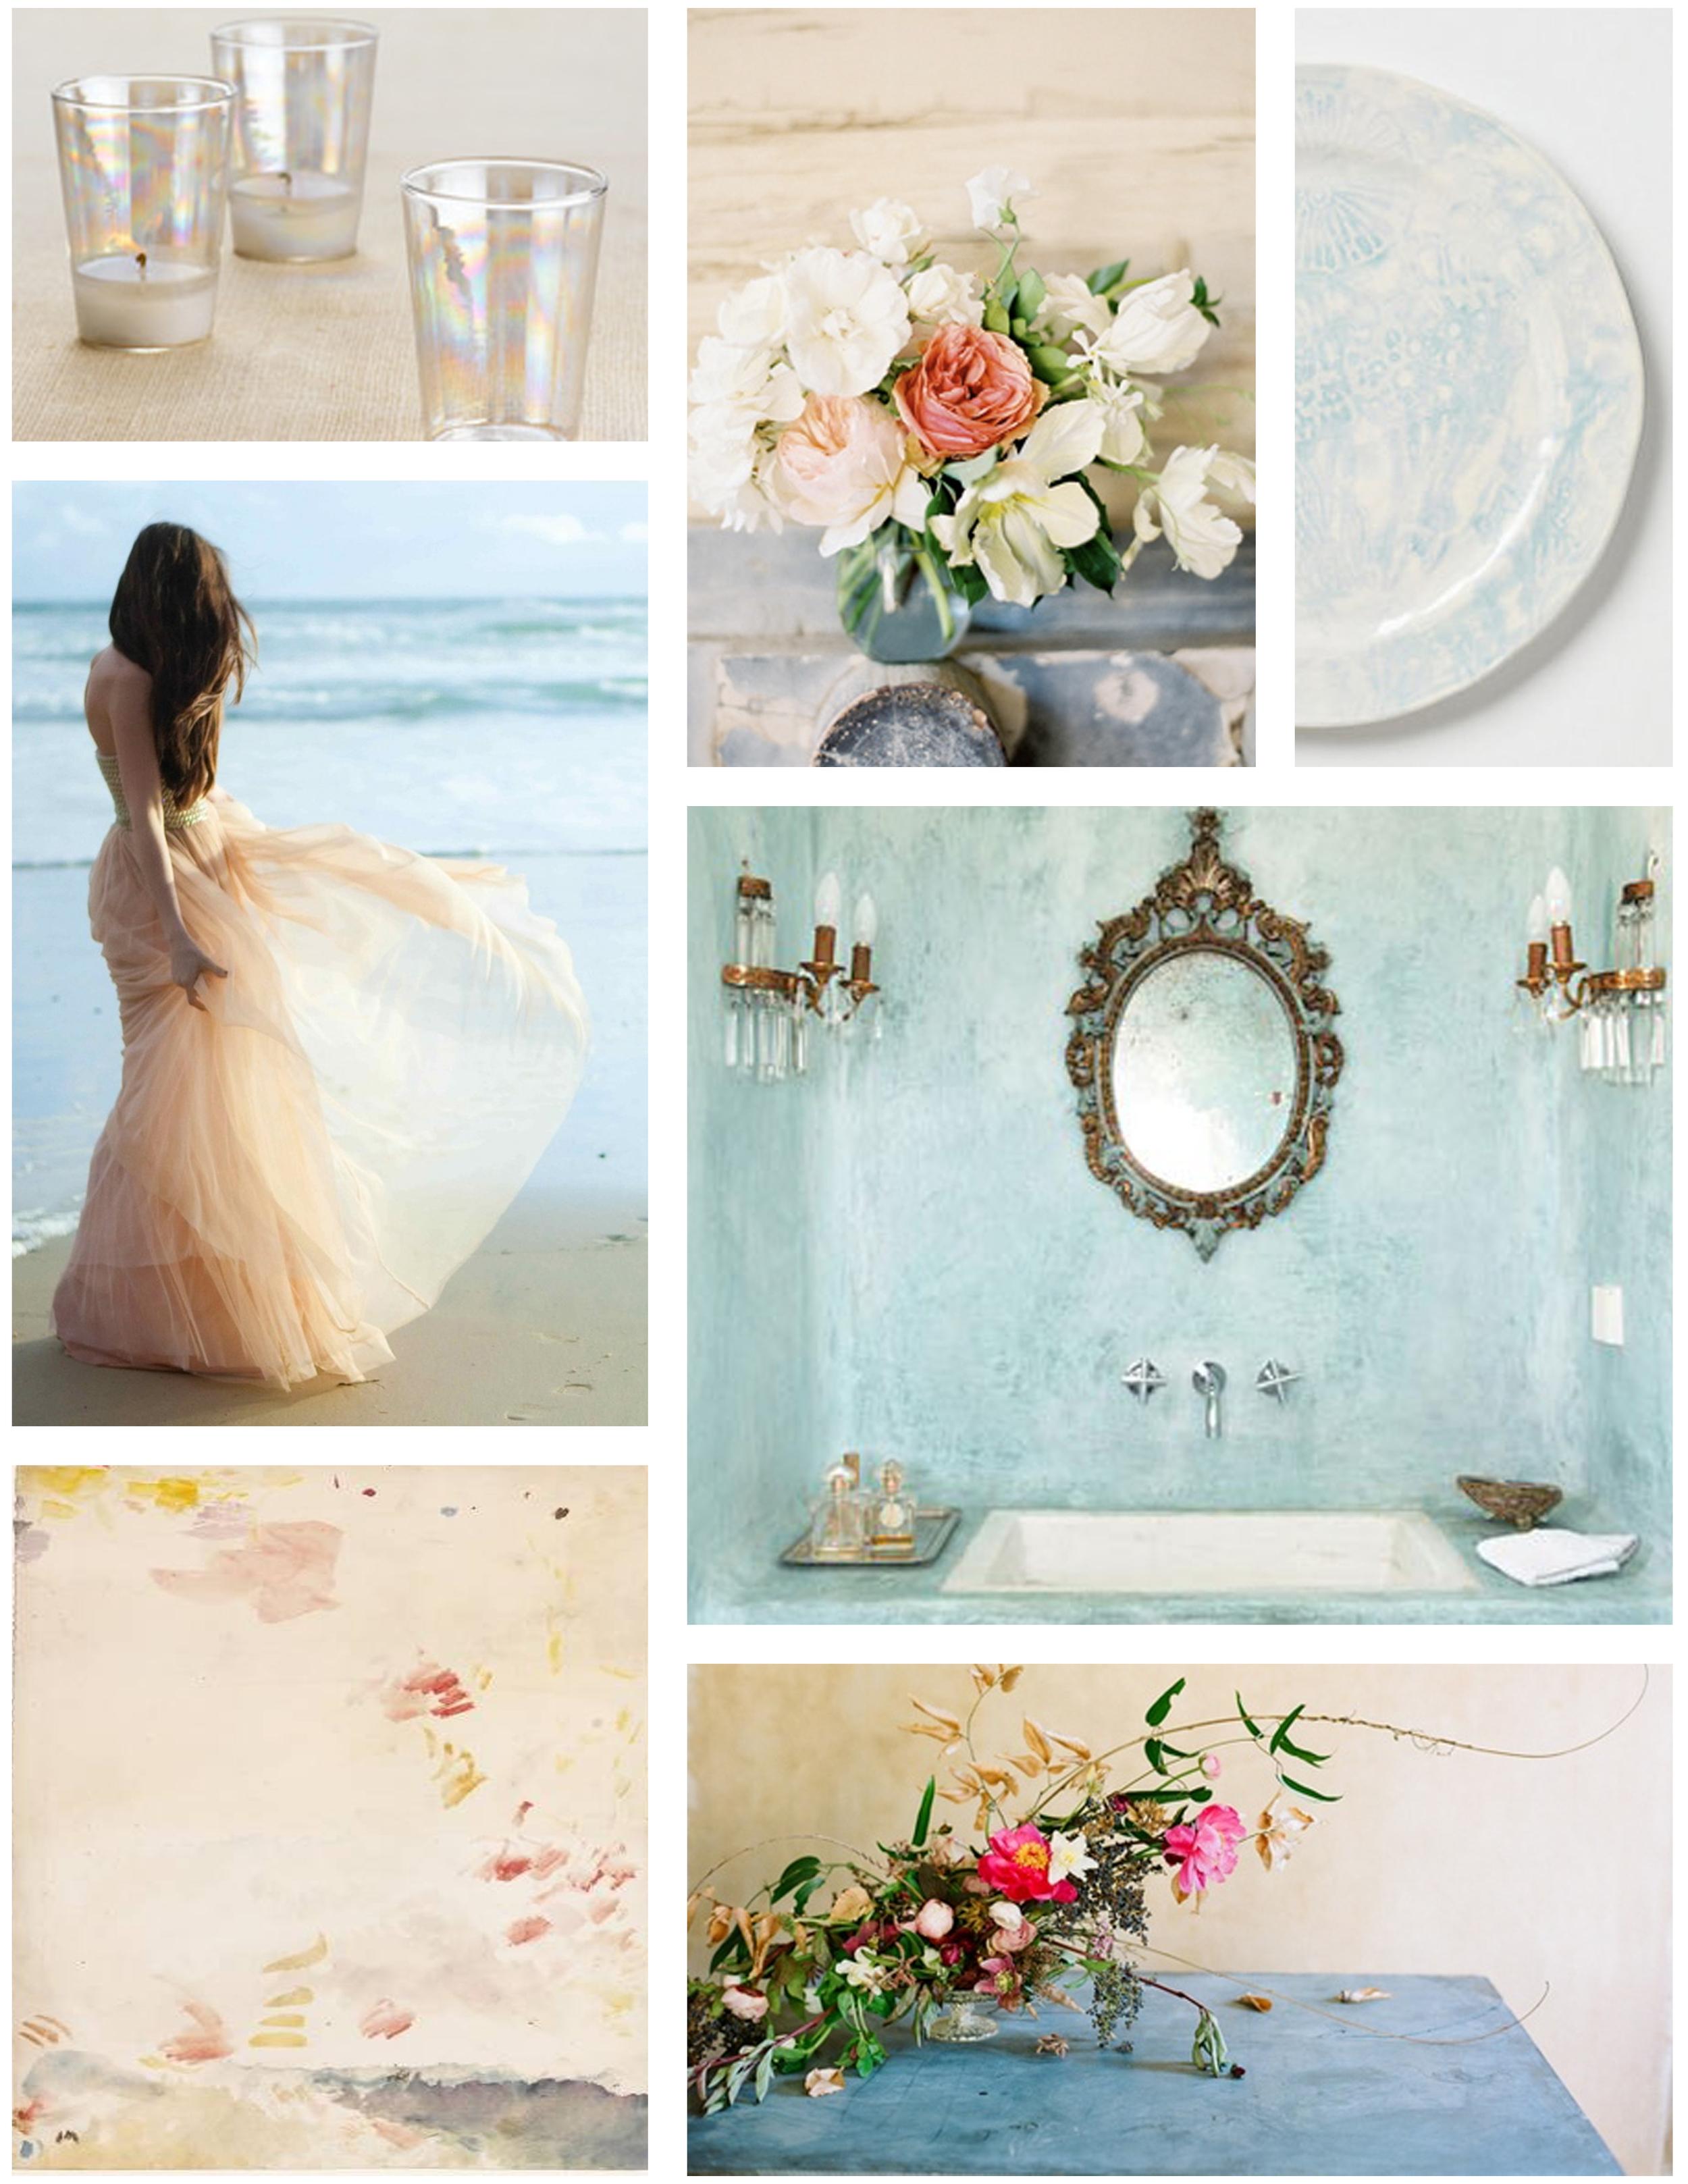 beach-wedding-inspiration-board-blue-peach-pink